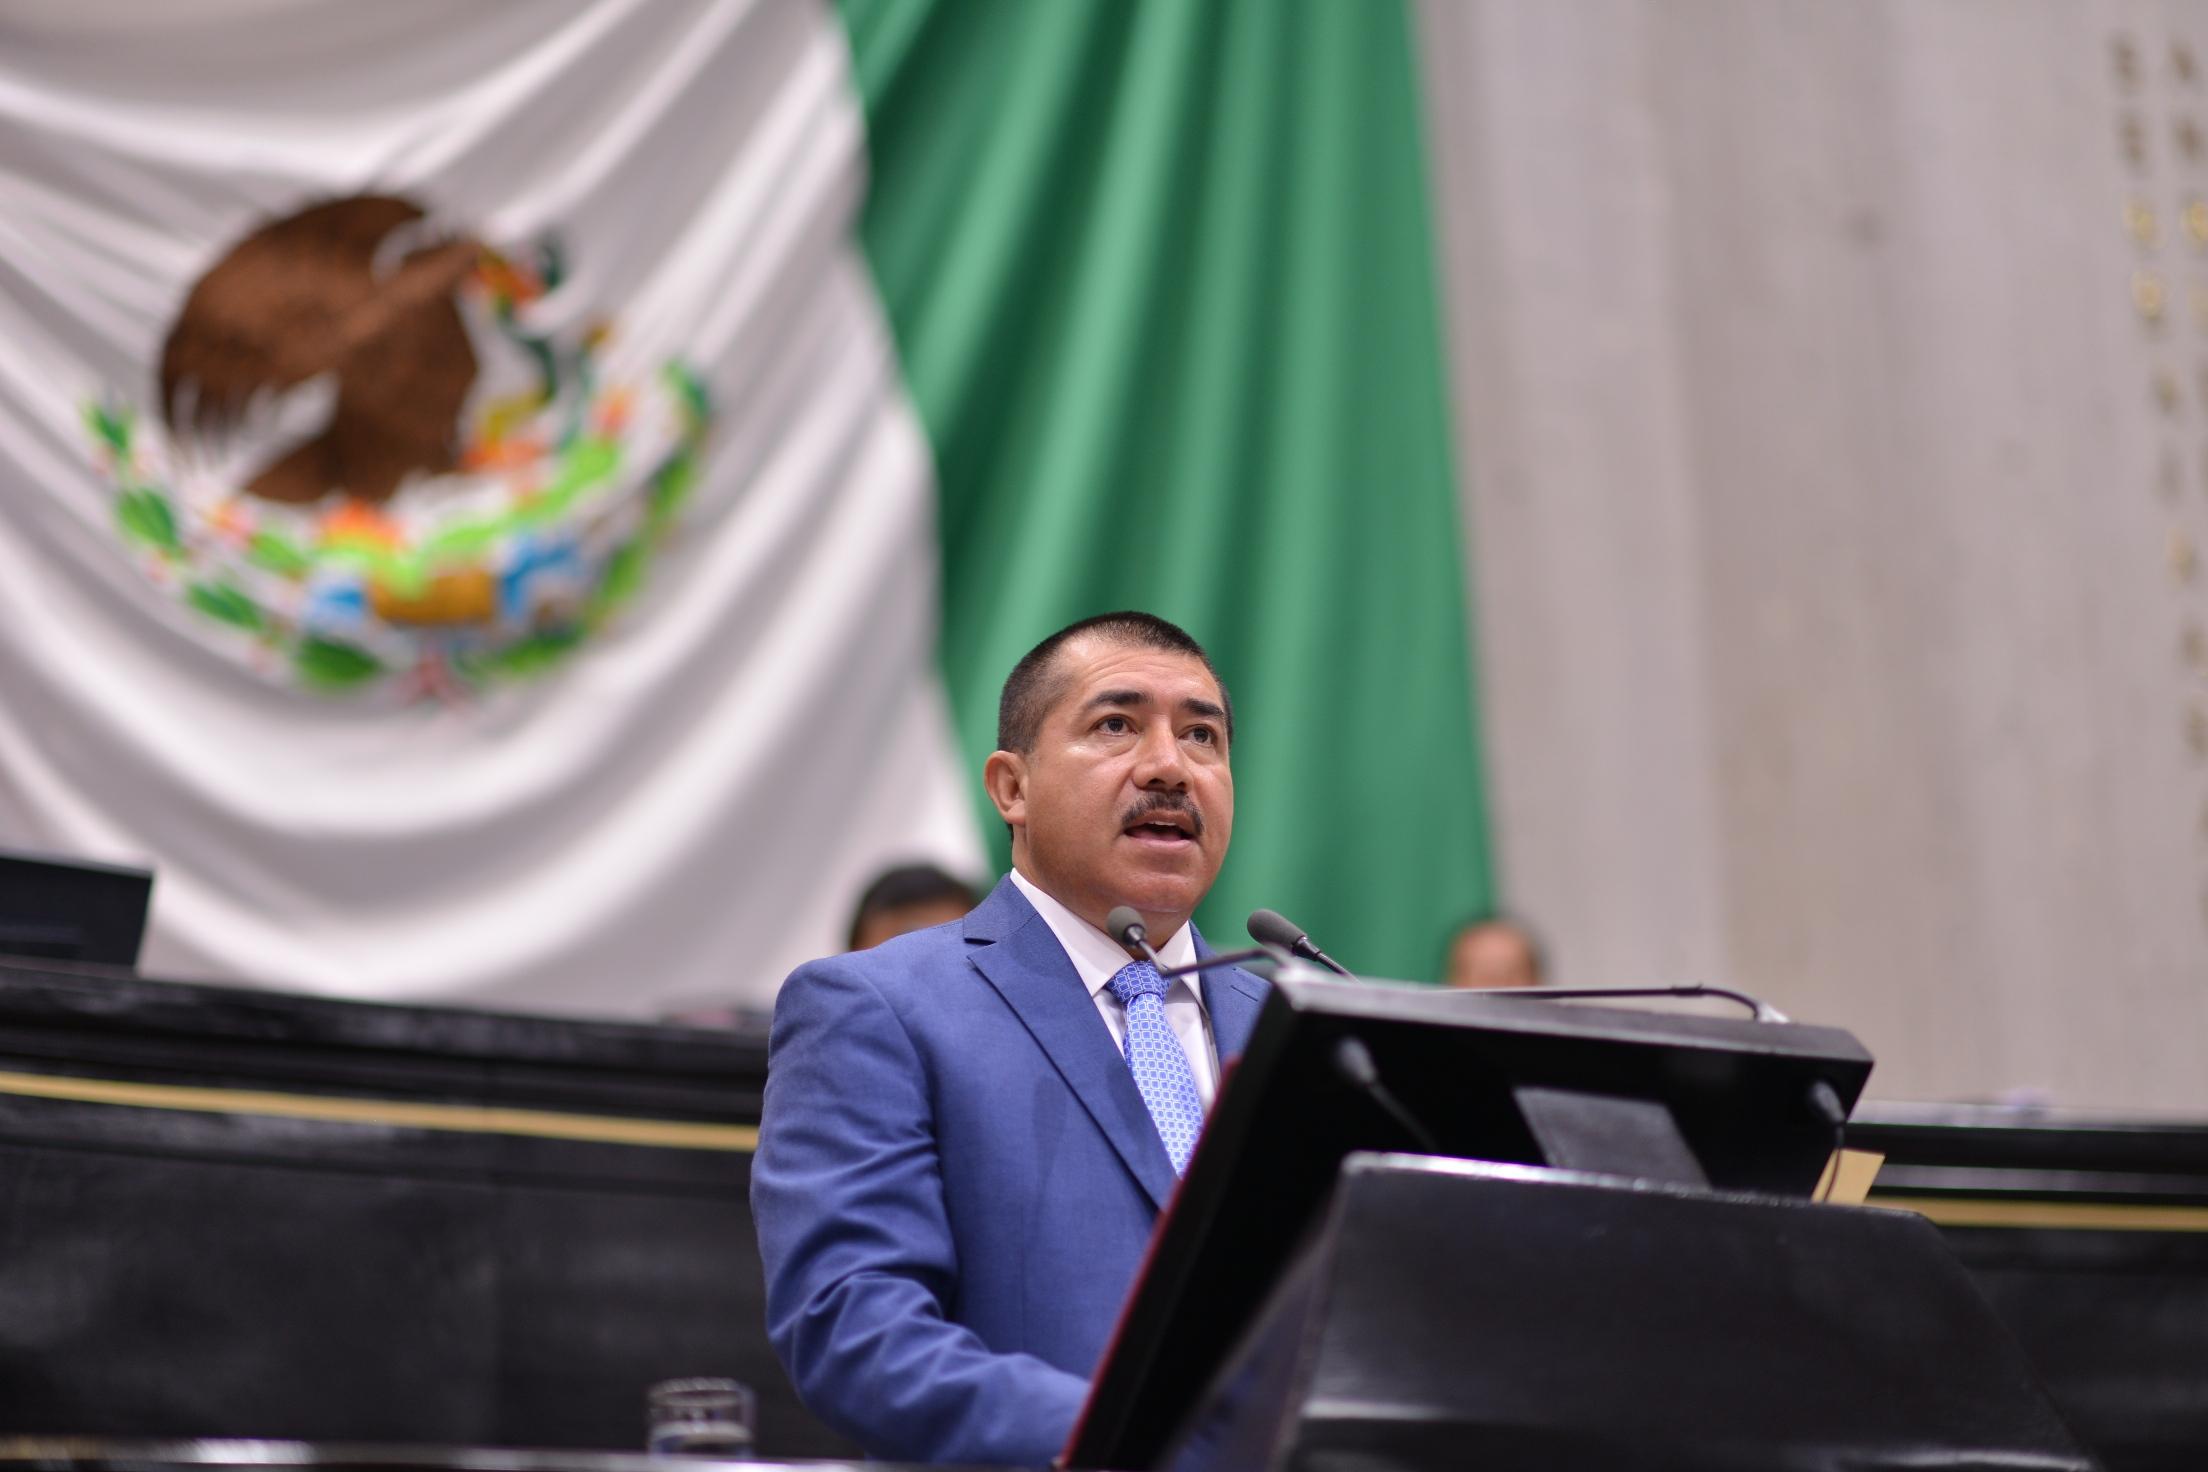 Afirma diputado José Roberto Arenas que continúa siendo priísta